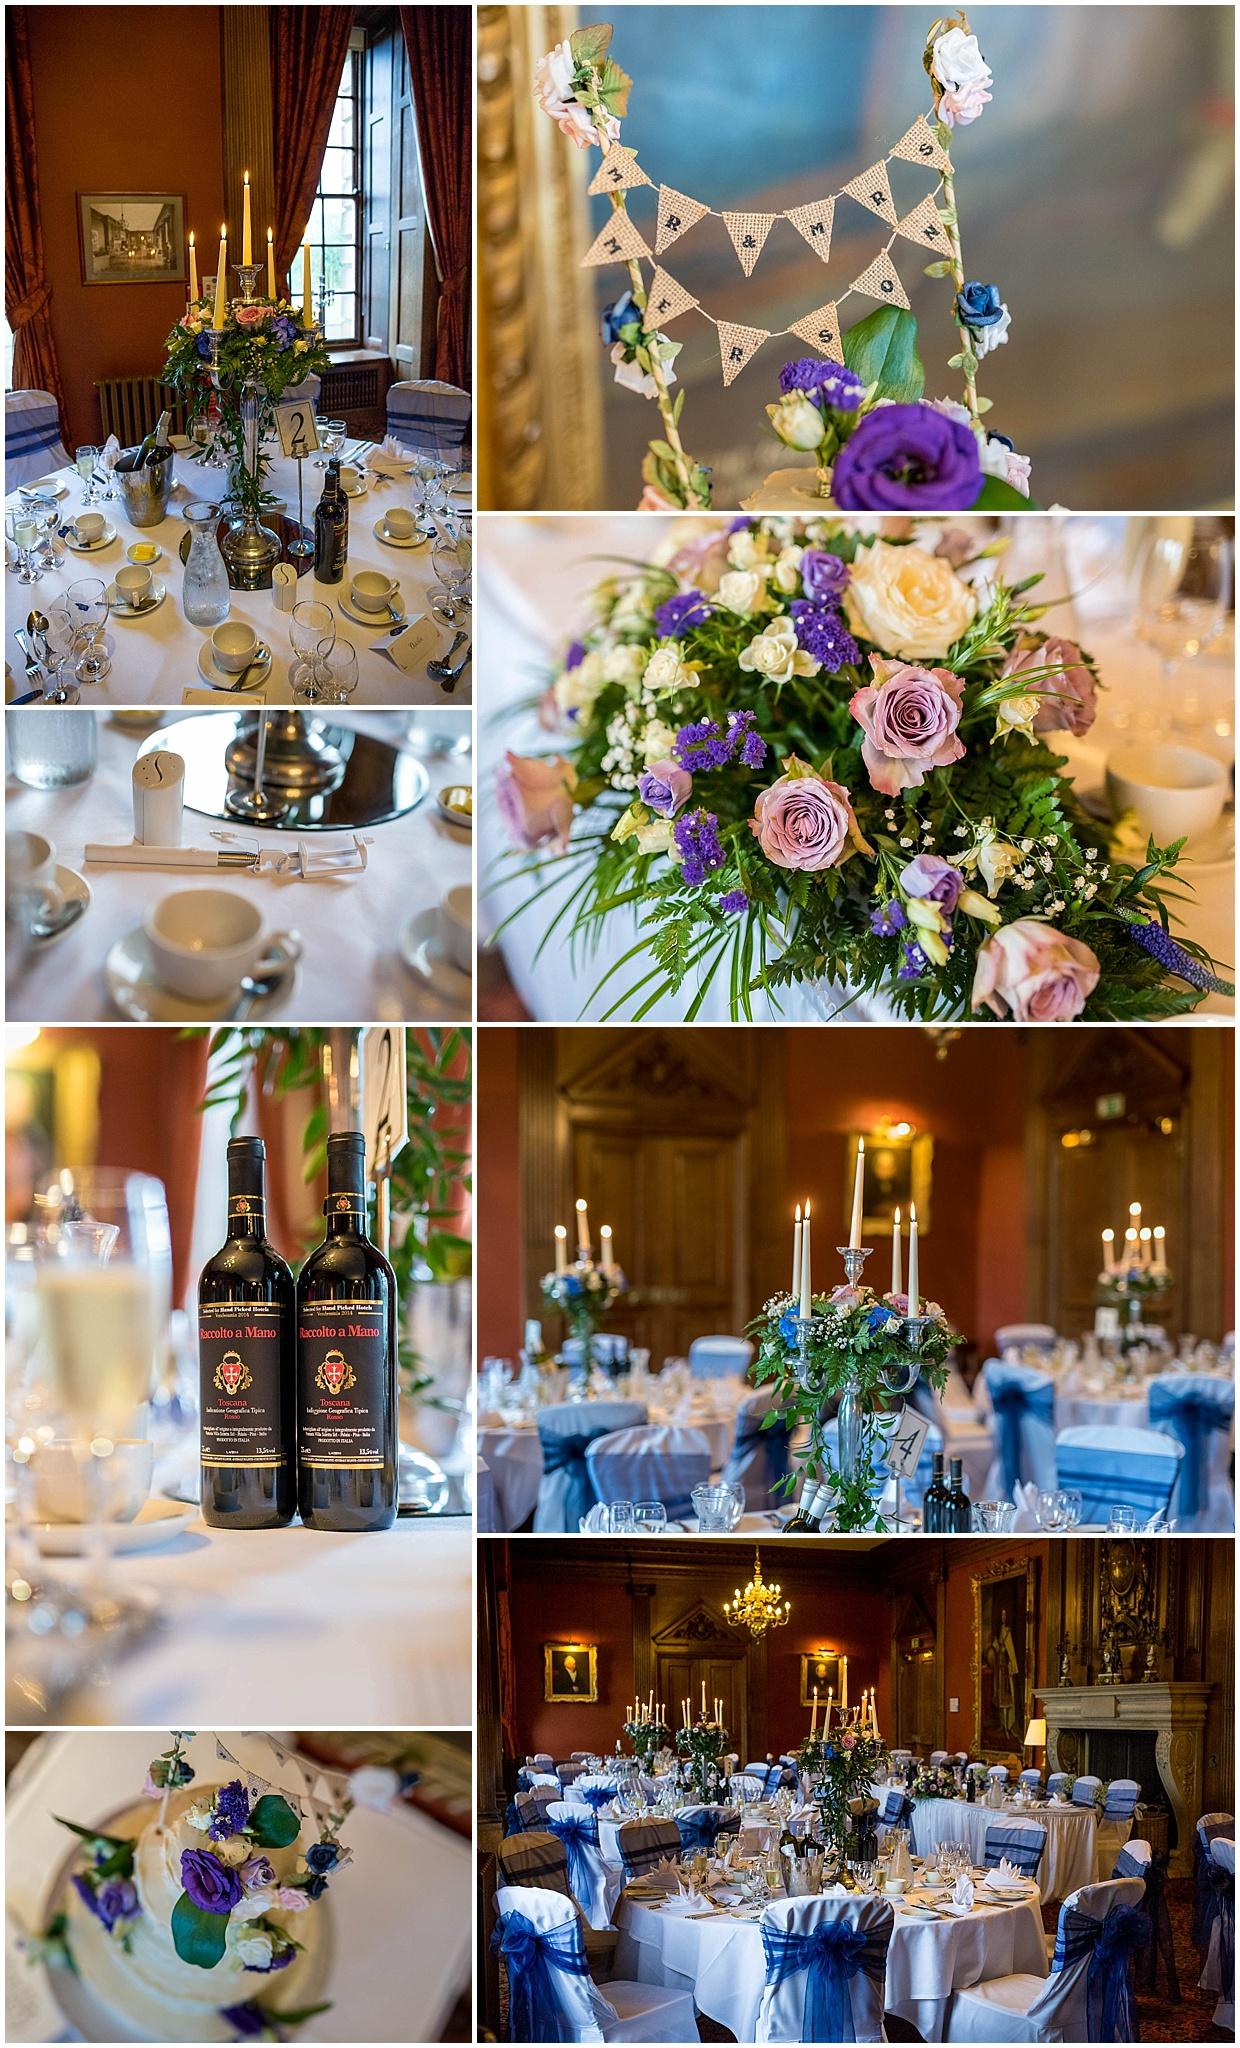 Crathorne Hall Hotel Wedding Photographer100.jpg